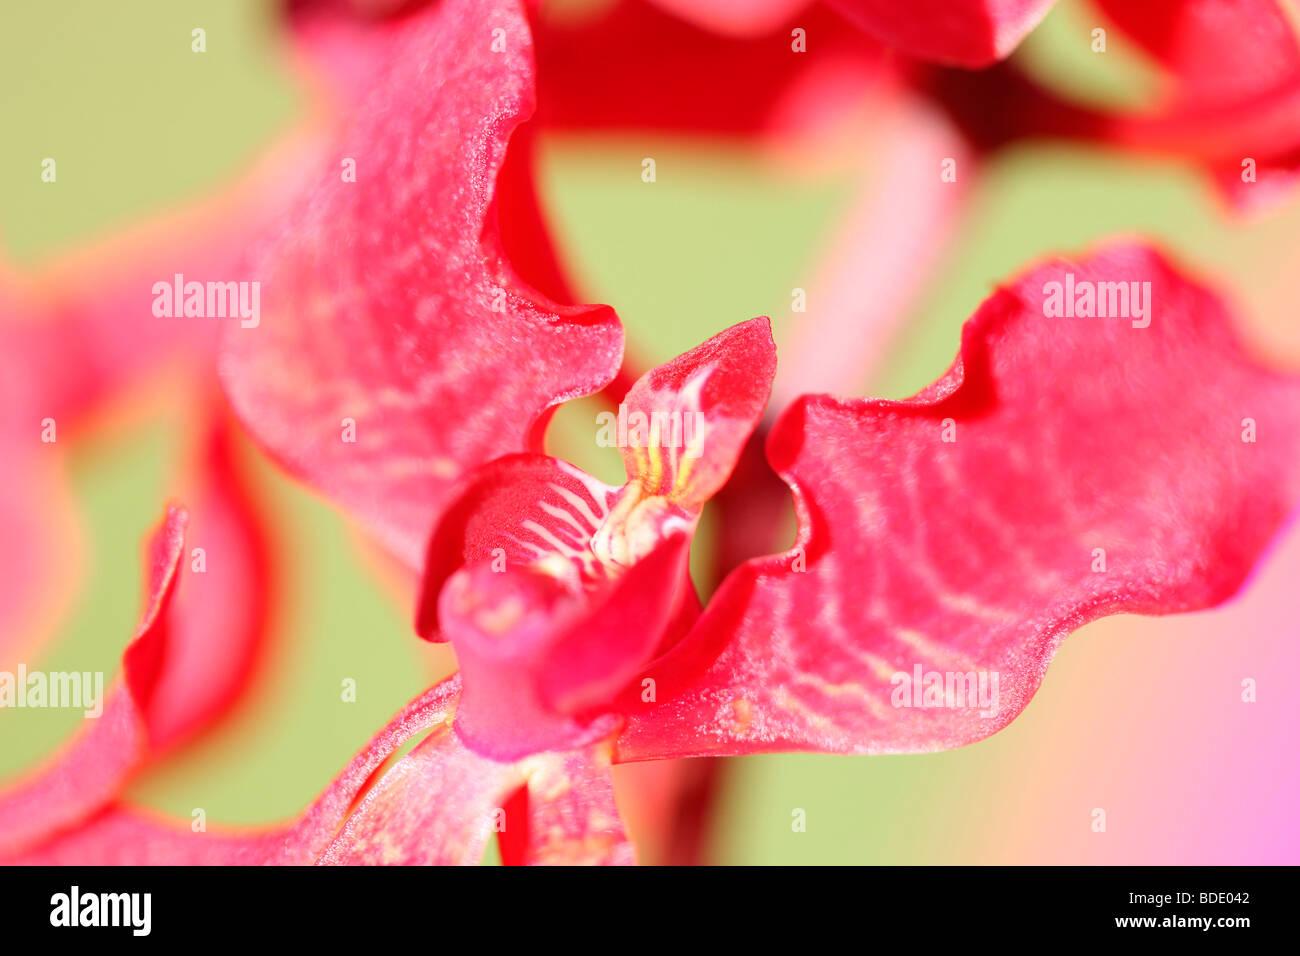 erstaunliche Azima Mokara Orchidee - Fine Art Fotografie Jane Ann Butler Fotografie JABP568 Stockbild